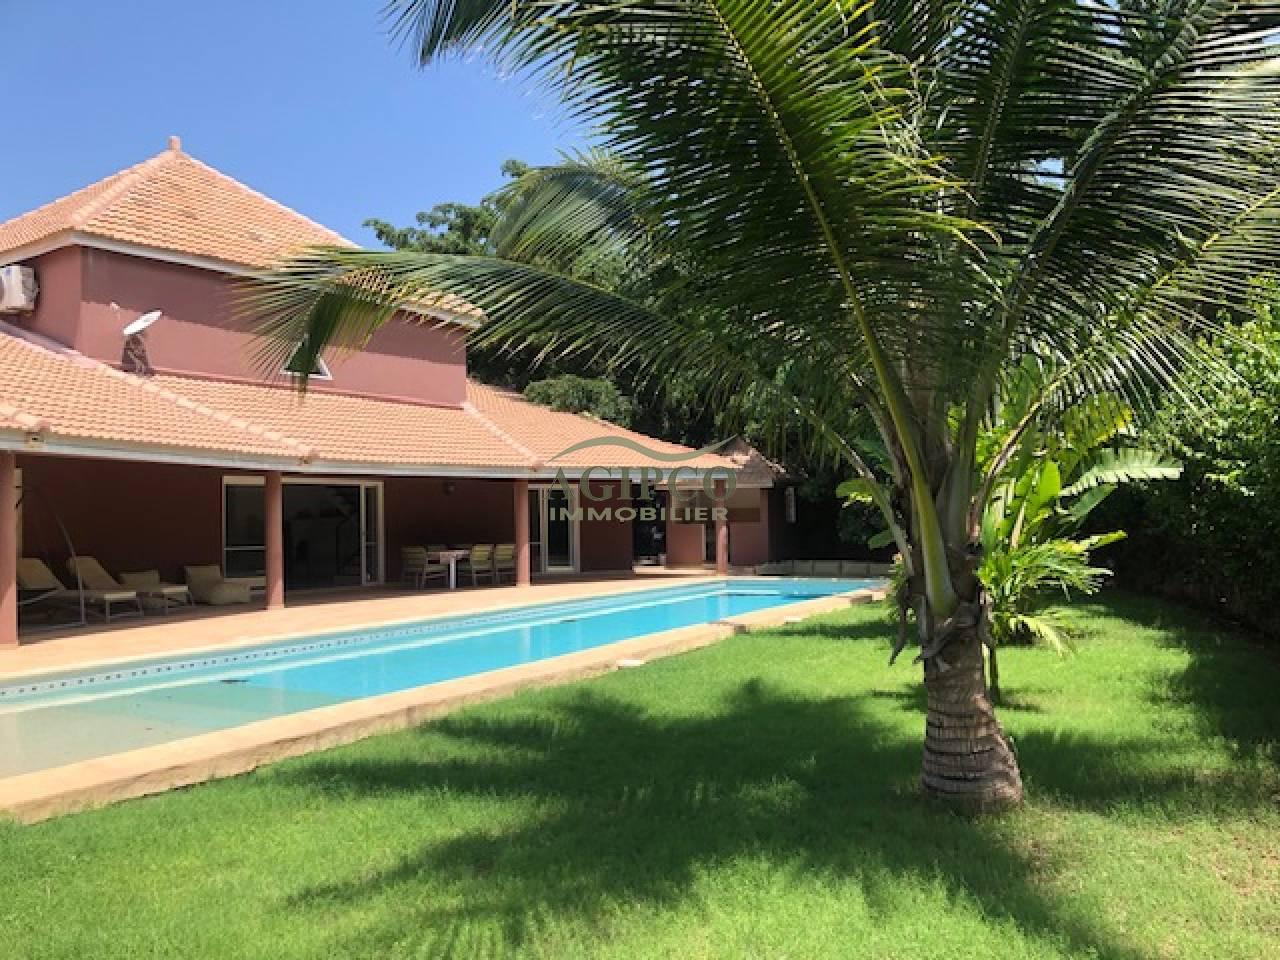 Saly, petite côte, 5 chambres, piscine